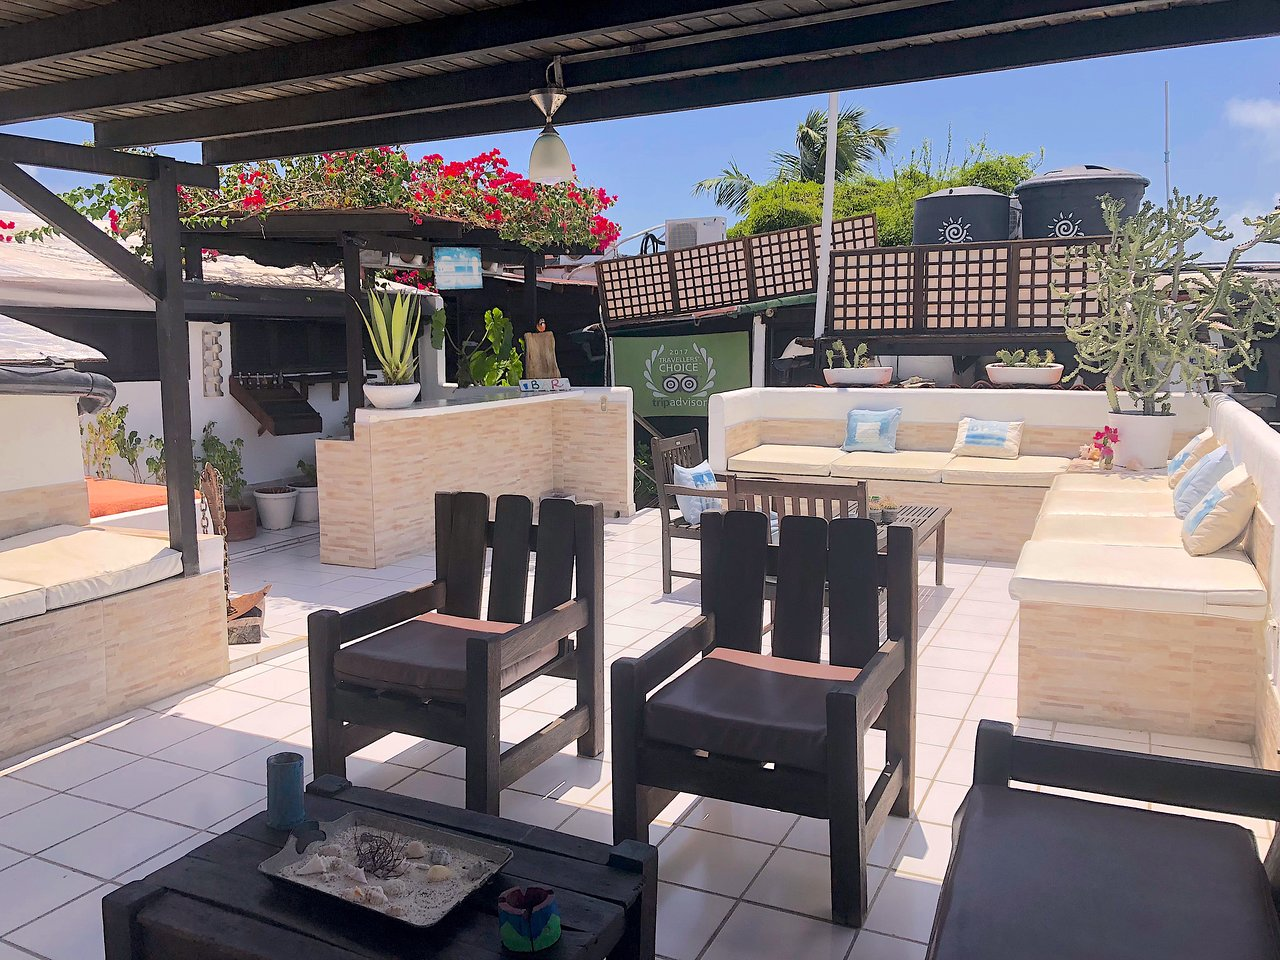 POSADA LAGUNITA - Prices & Hotel Reviews (Los Roques